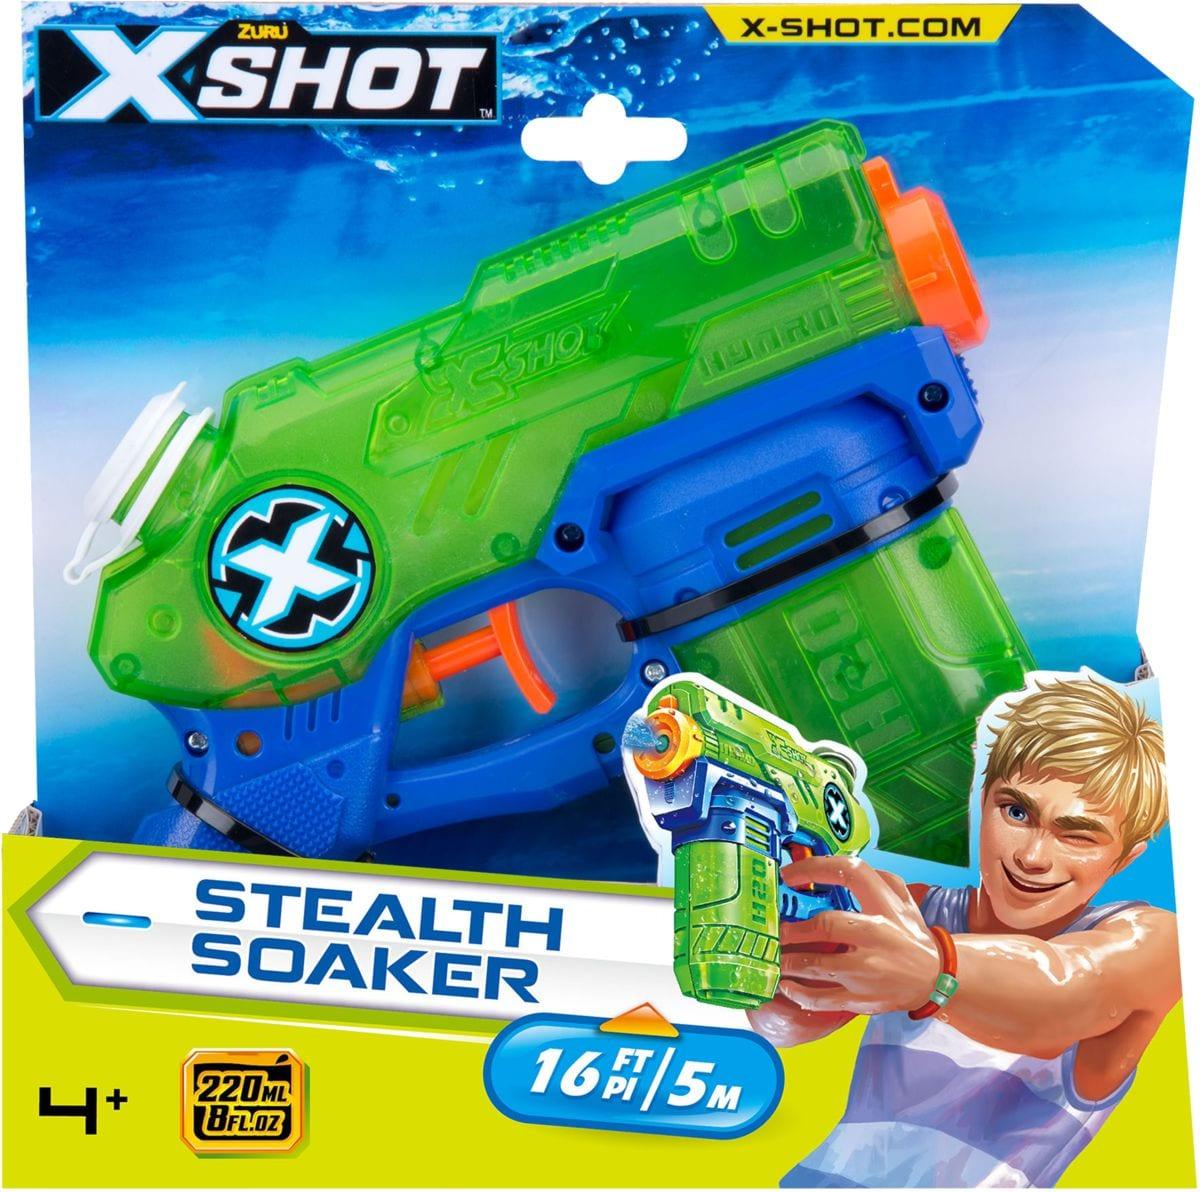 X-Shot Stealth Soaker Blaster